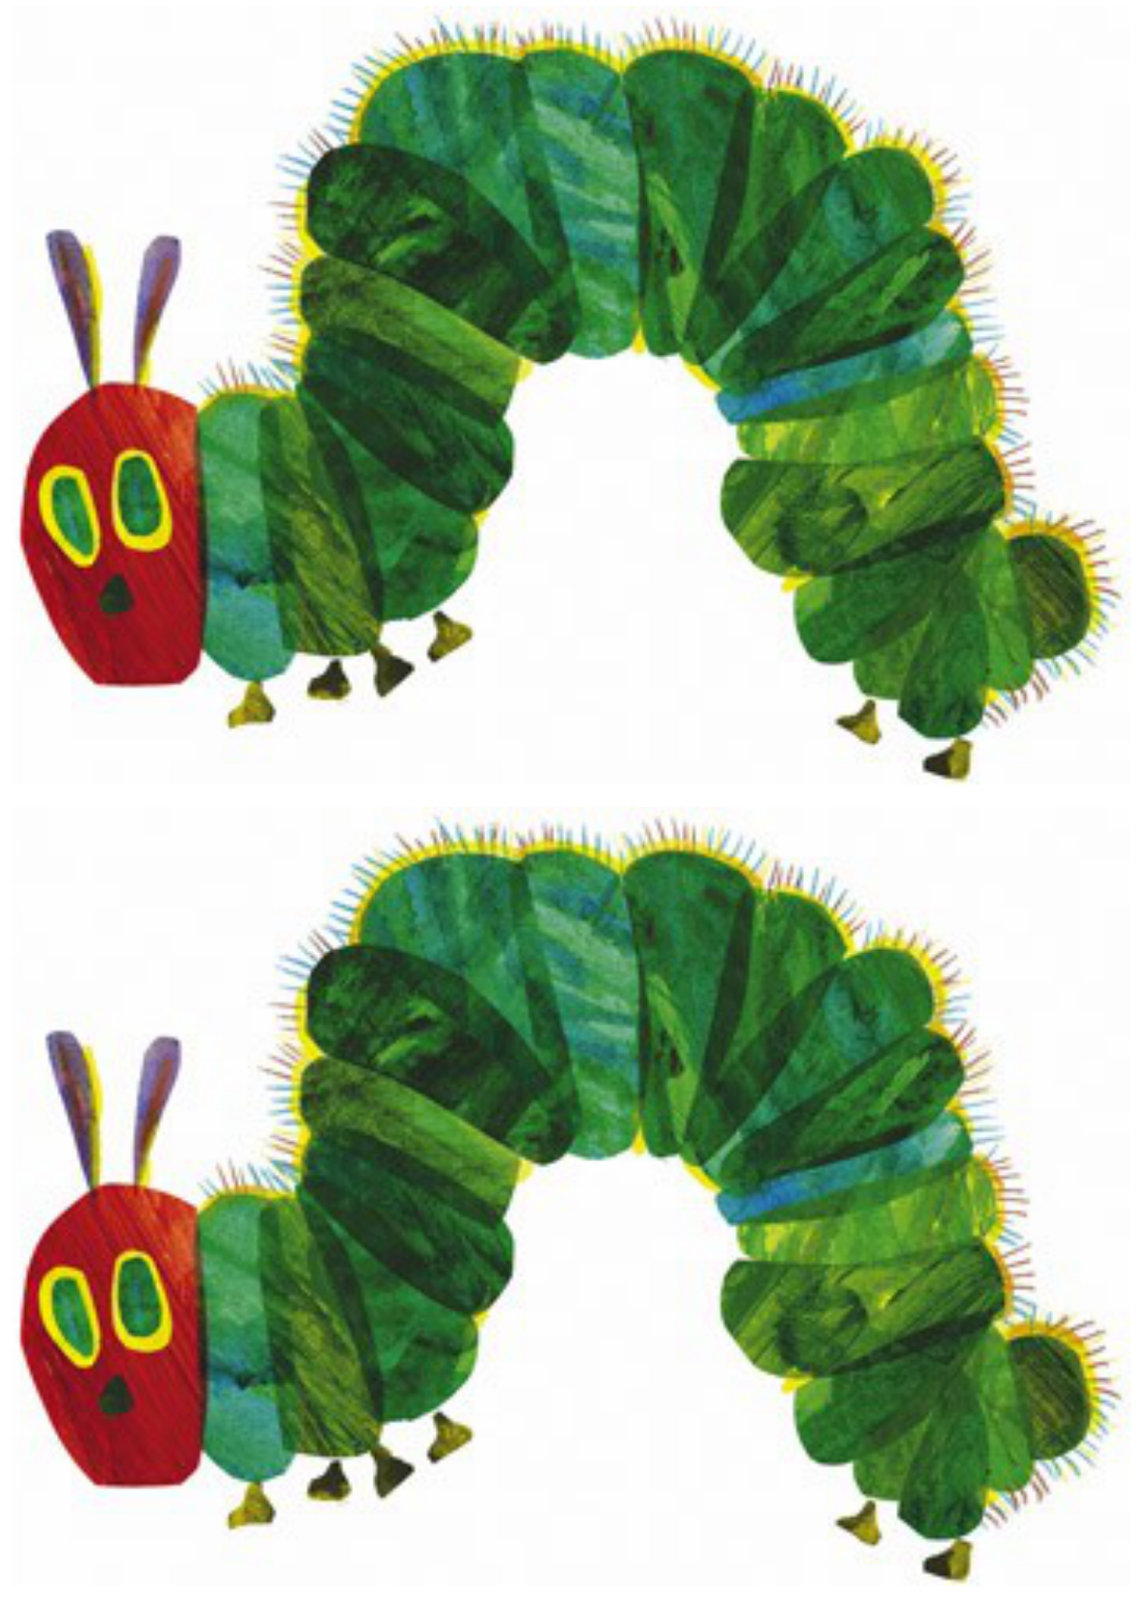 The Life of Jennifer Dawn: DIY The Very Hungry Caterpillar T-Shirt